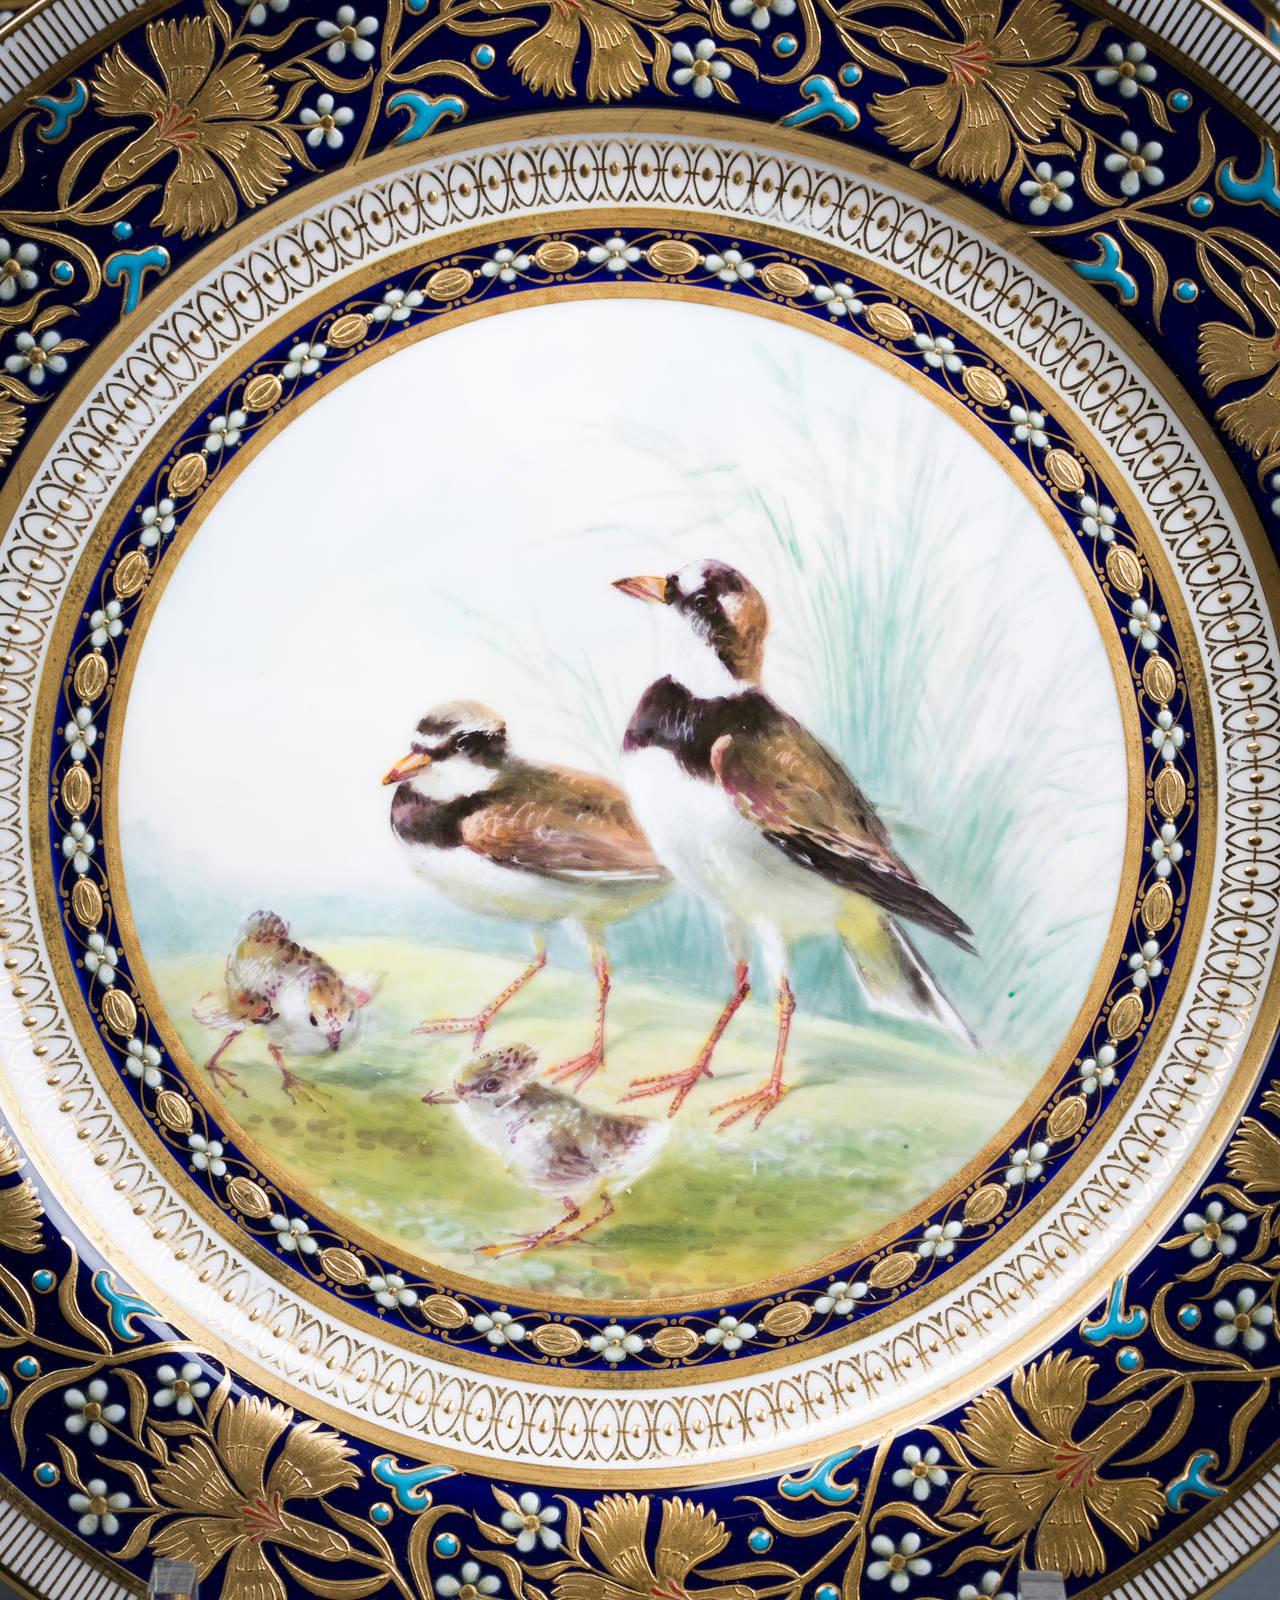 Set of 18 English Porcelain Plates, Minton, circa 1890 For Sale 4